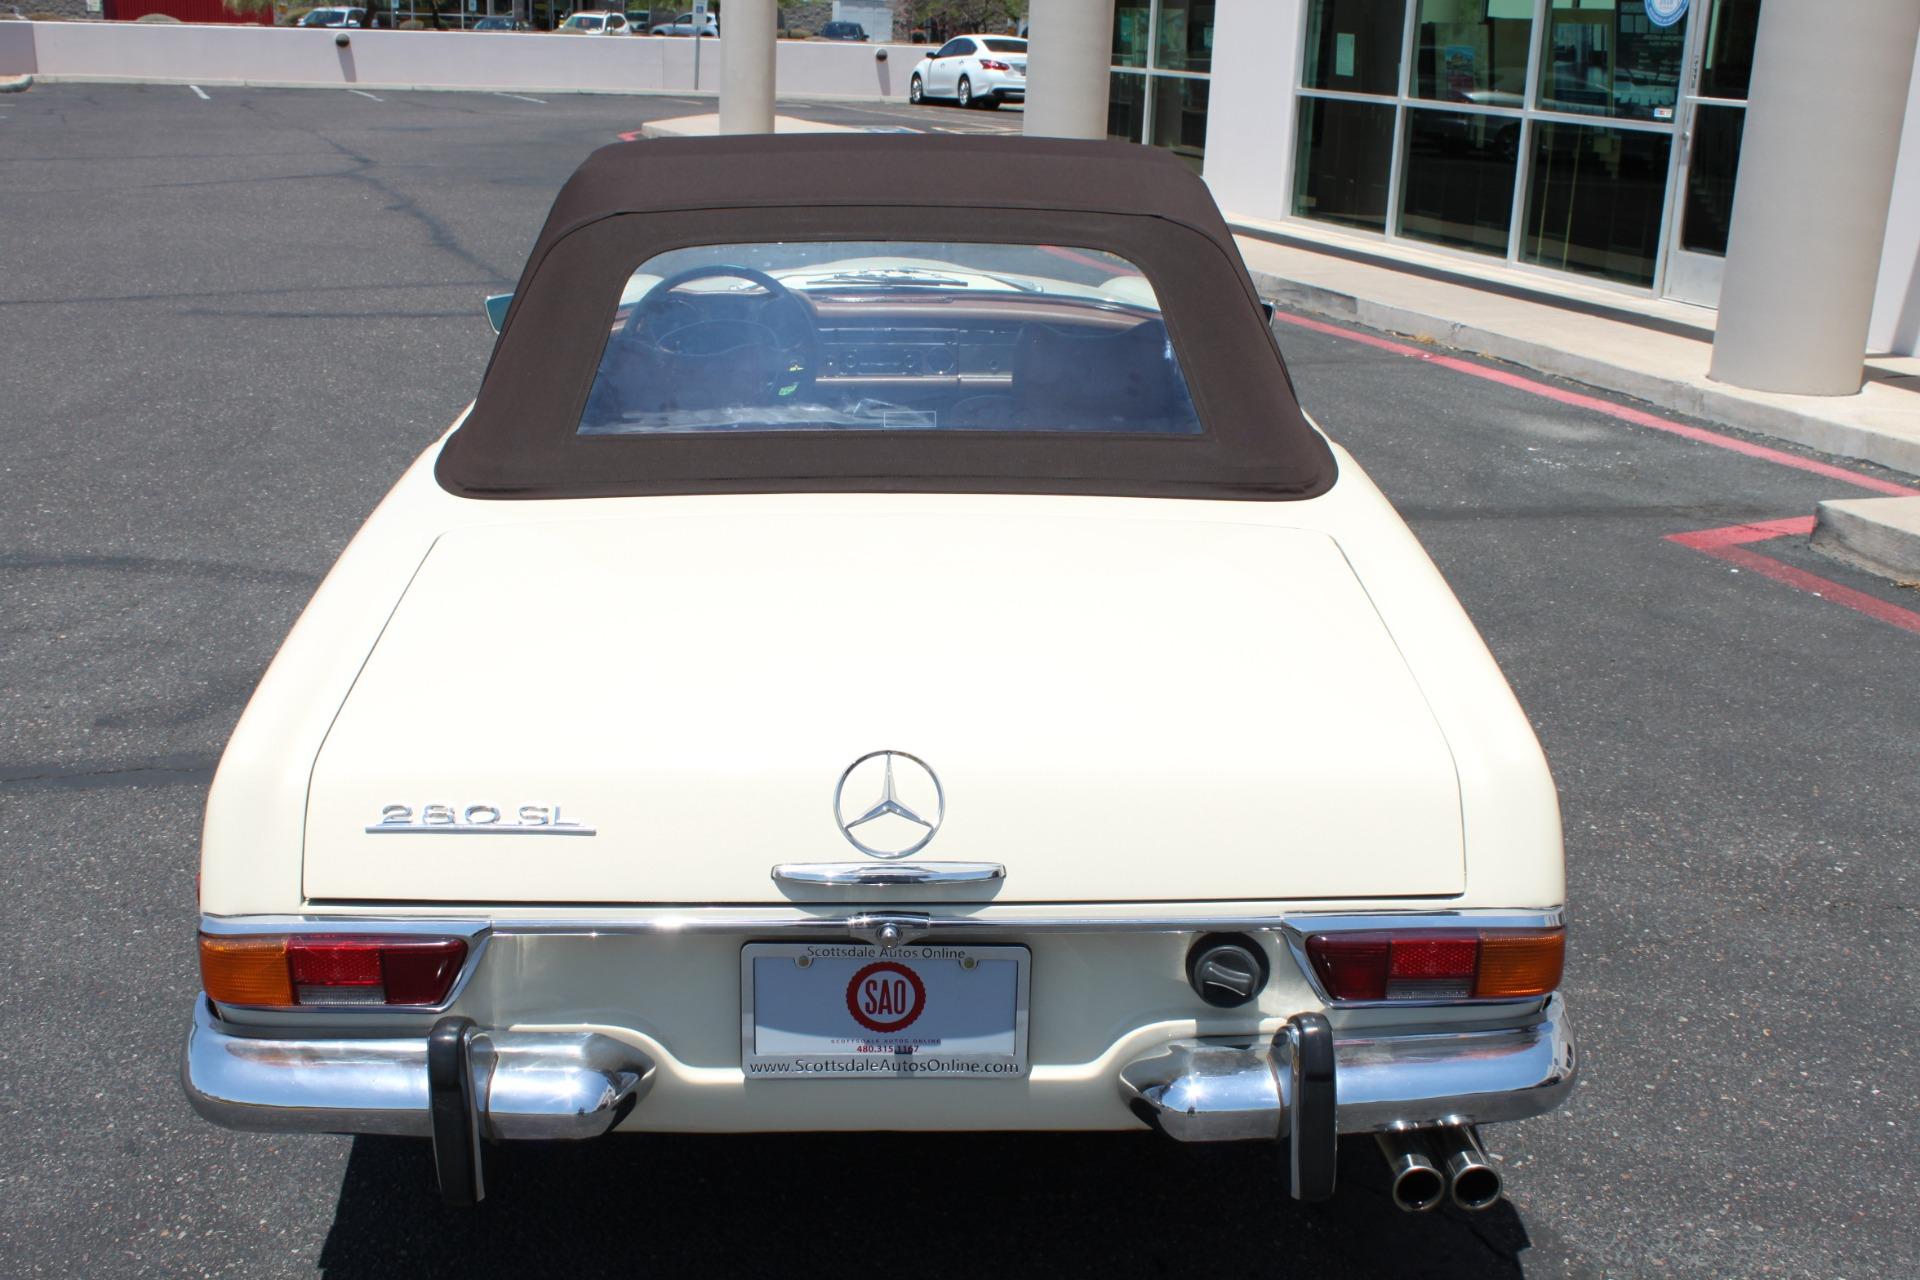 Used-1971-Mercedes-Benz-280SL-Convertible-Lexus